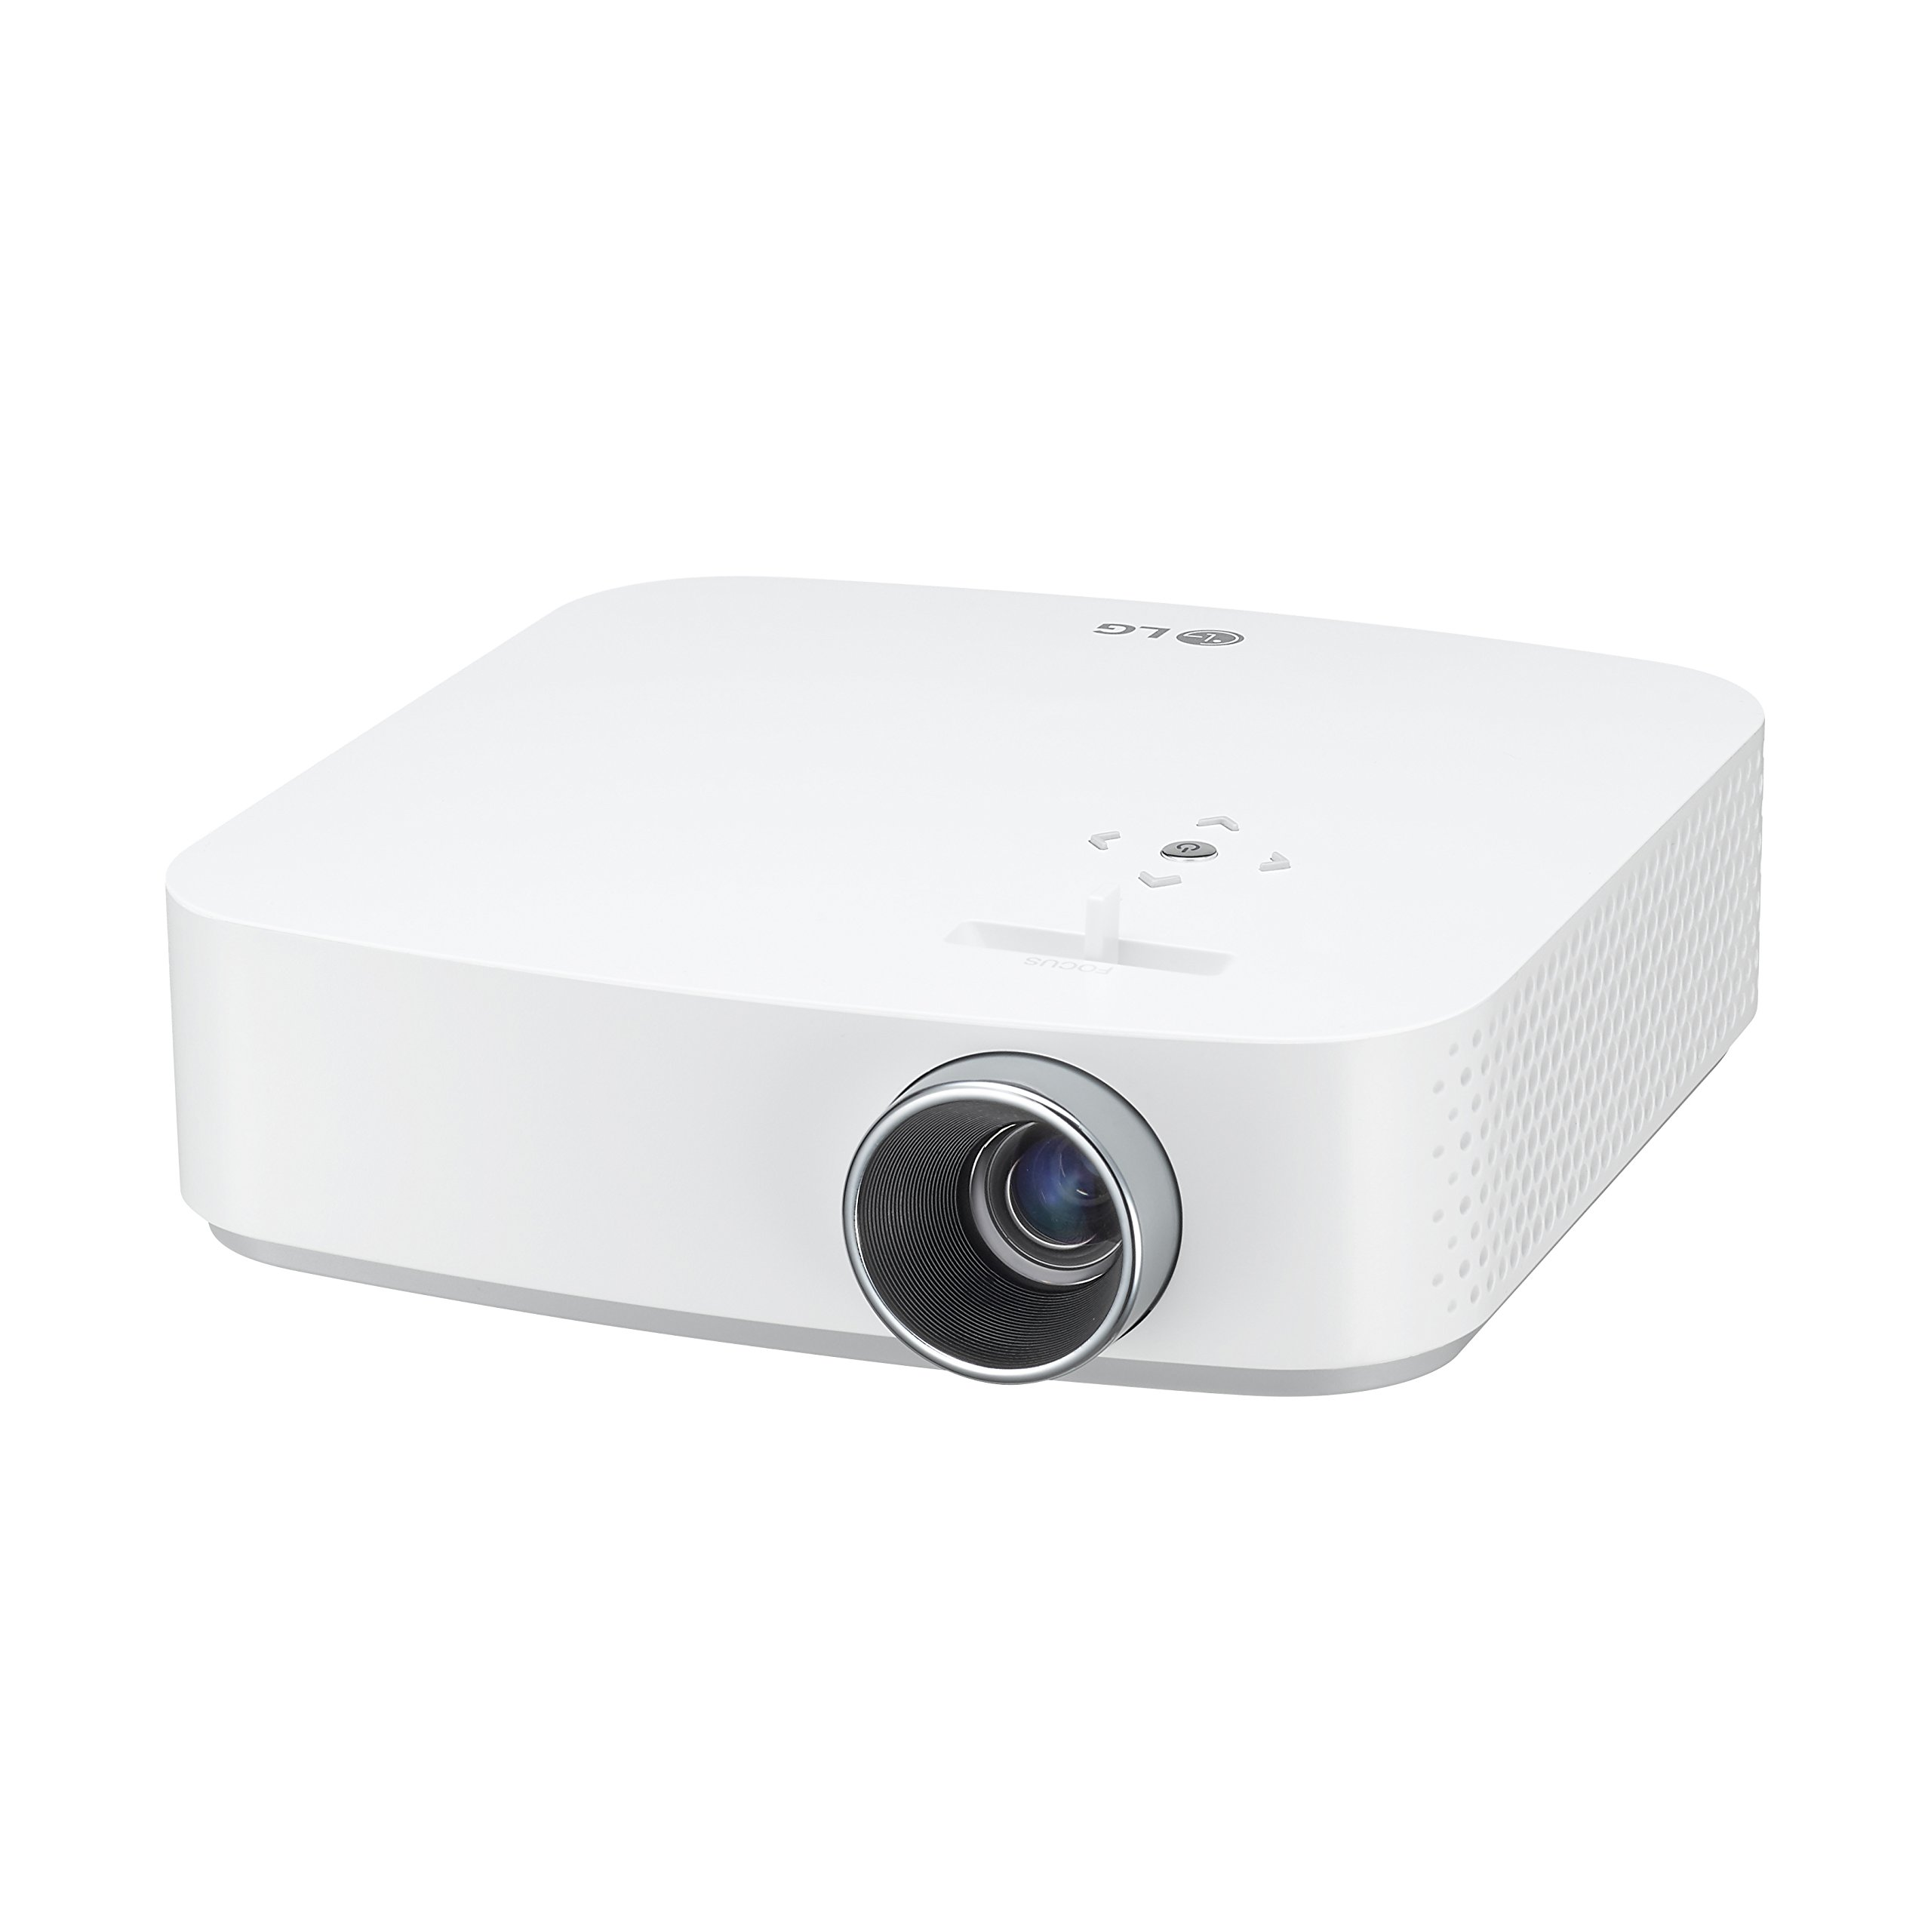 LG PF50KA Portable Theater Projector